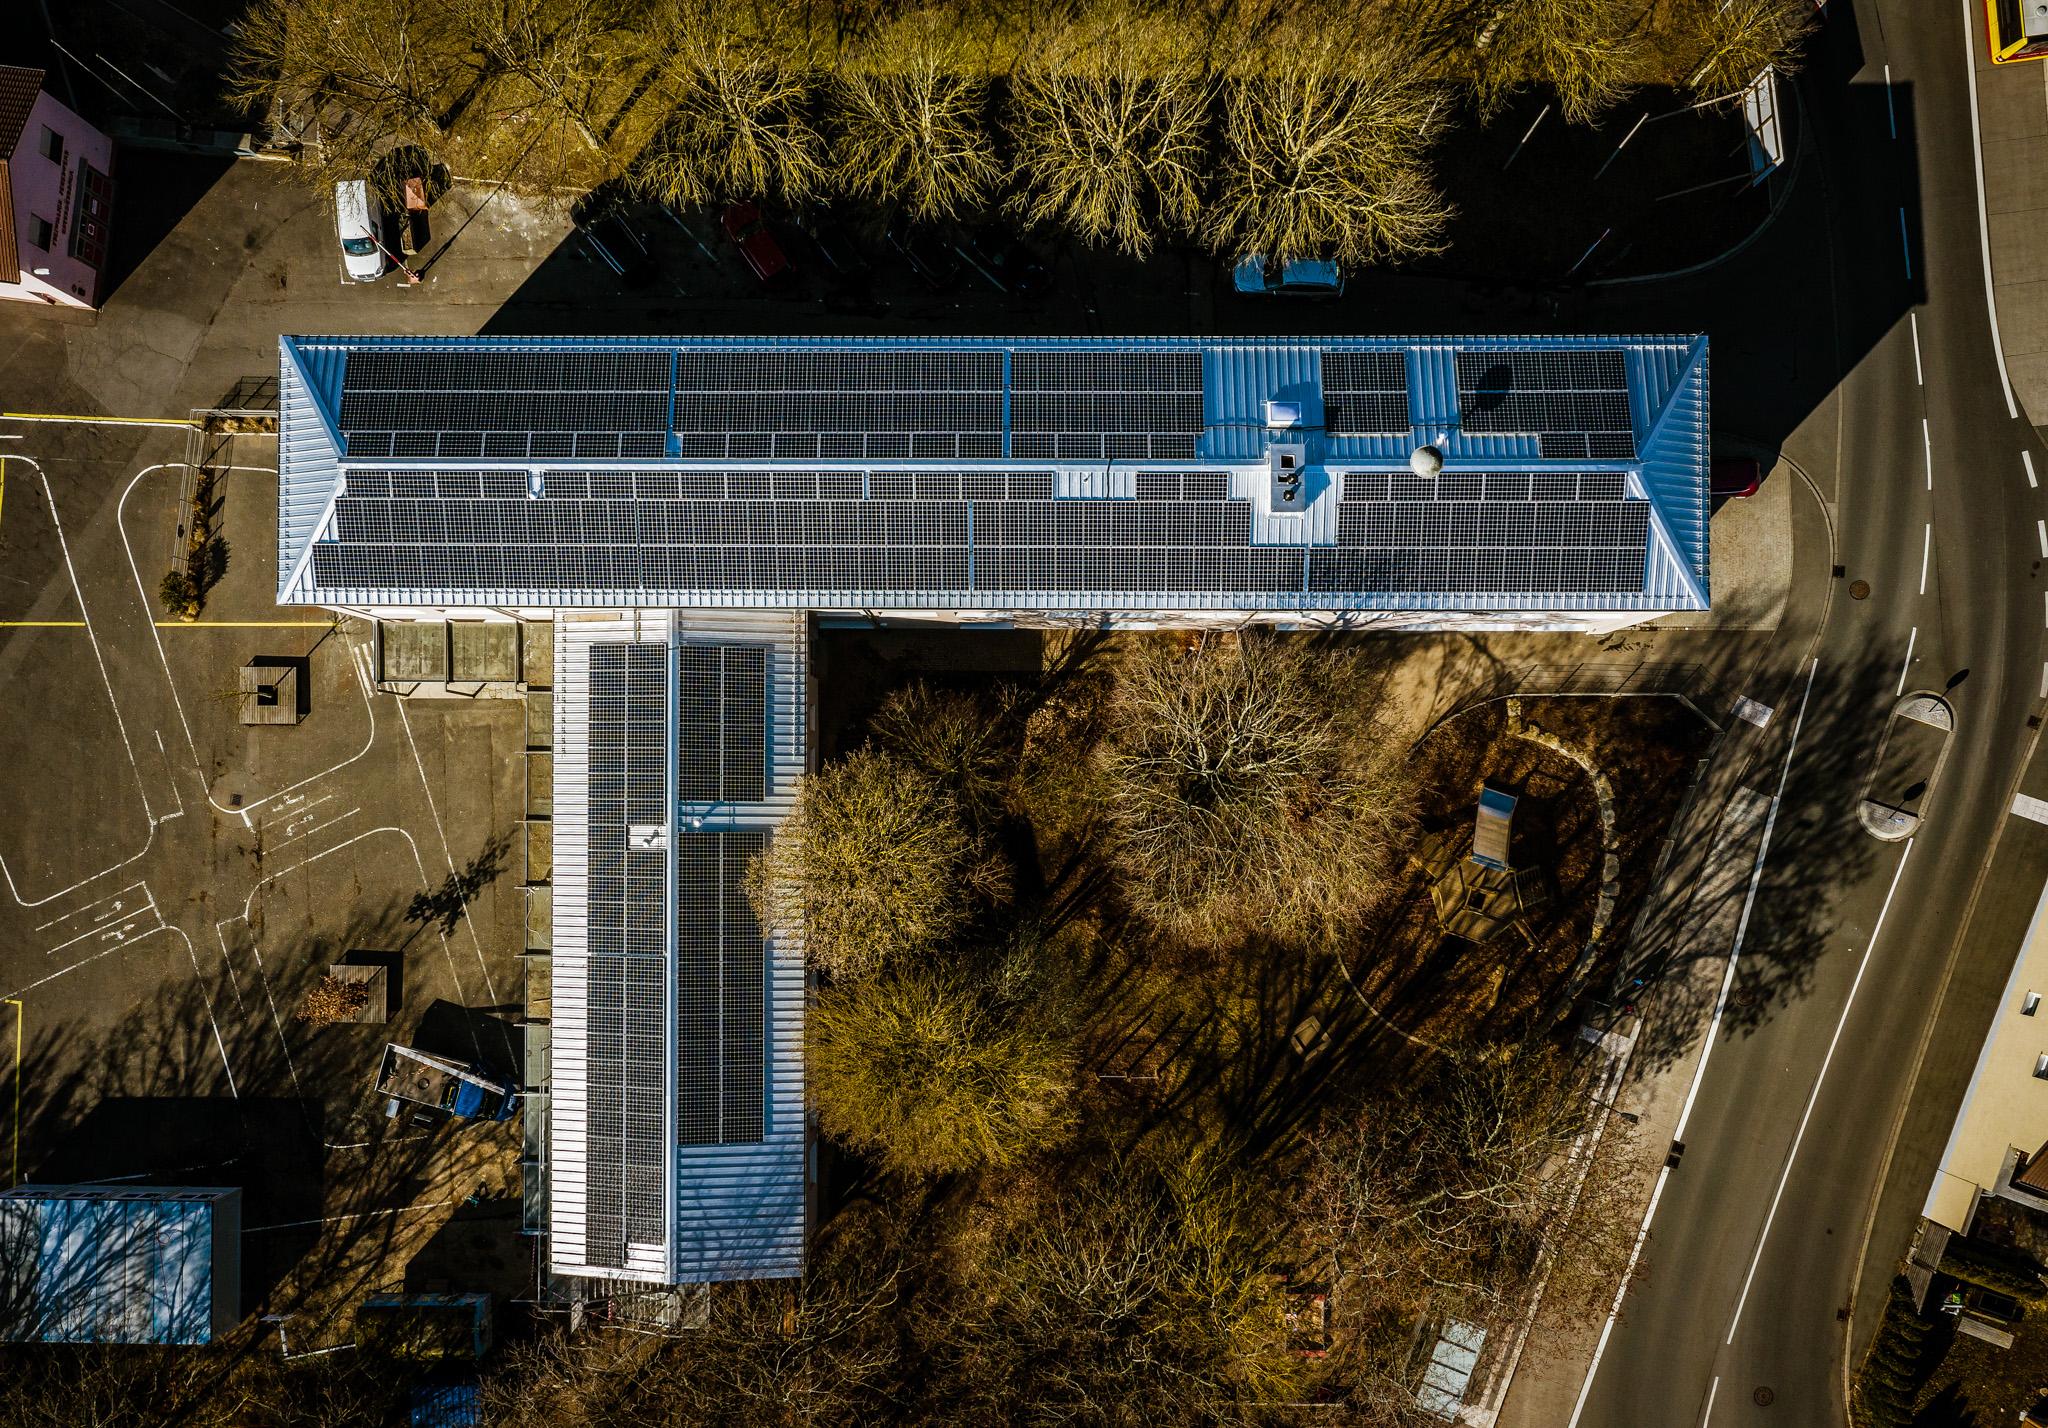 Solarstrom via Grundschuldach. Foto: TOM BAUER – AD PHOTOGRAPHY